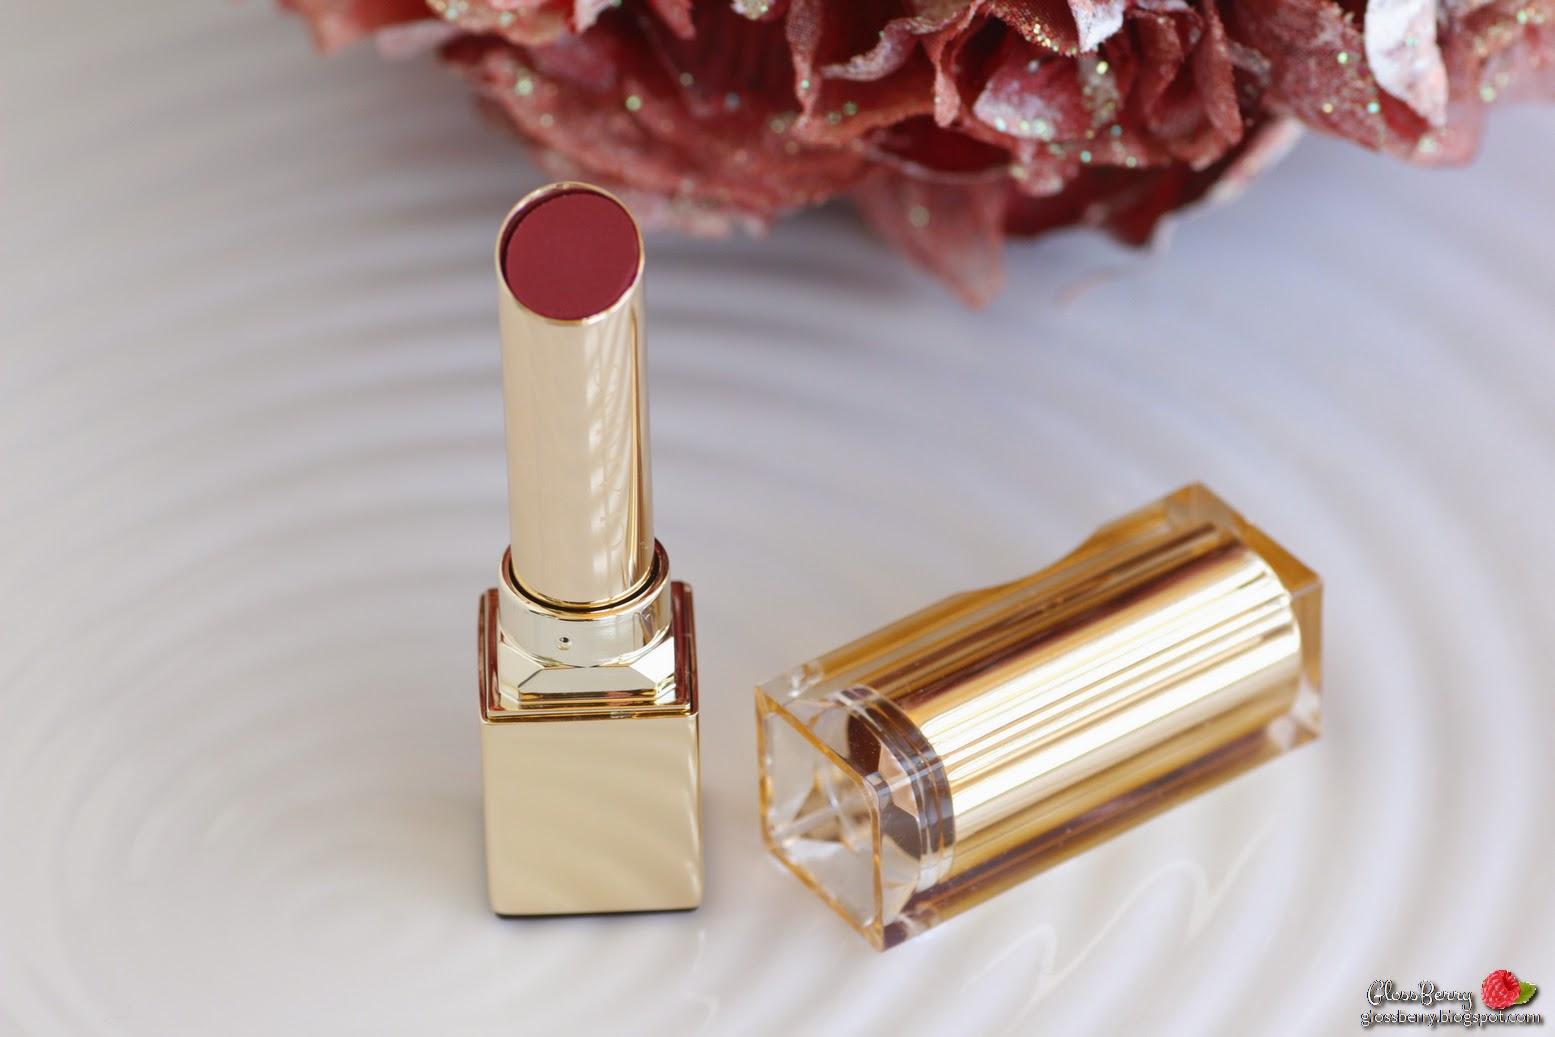 Clarins - Rouge Eclat - 06 True Aubergine שפתון מומלץ לחורף לסתיו קלרינס שזיף חציל סגול בורדו סקירה swatch review lipswatch